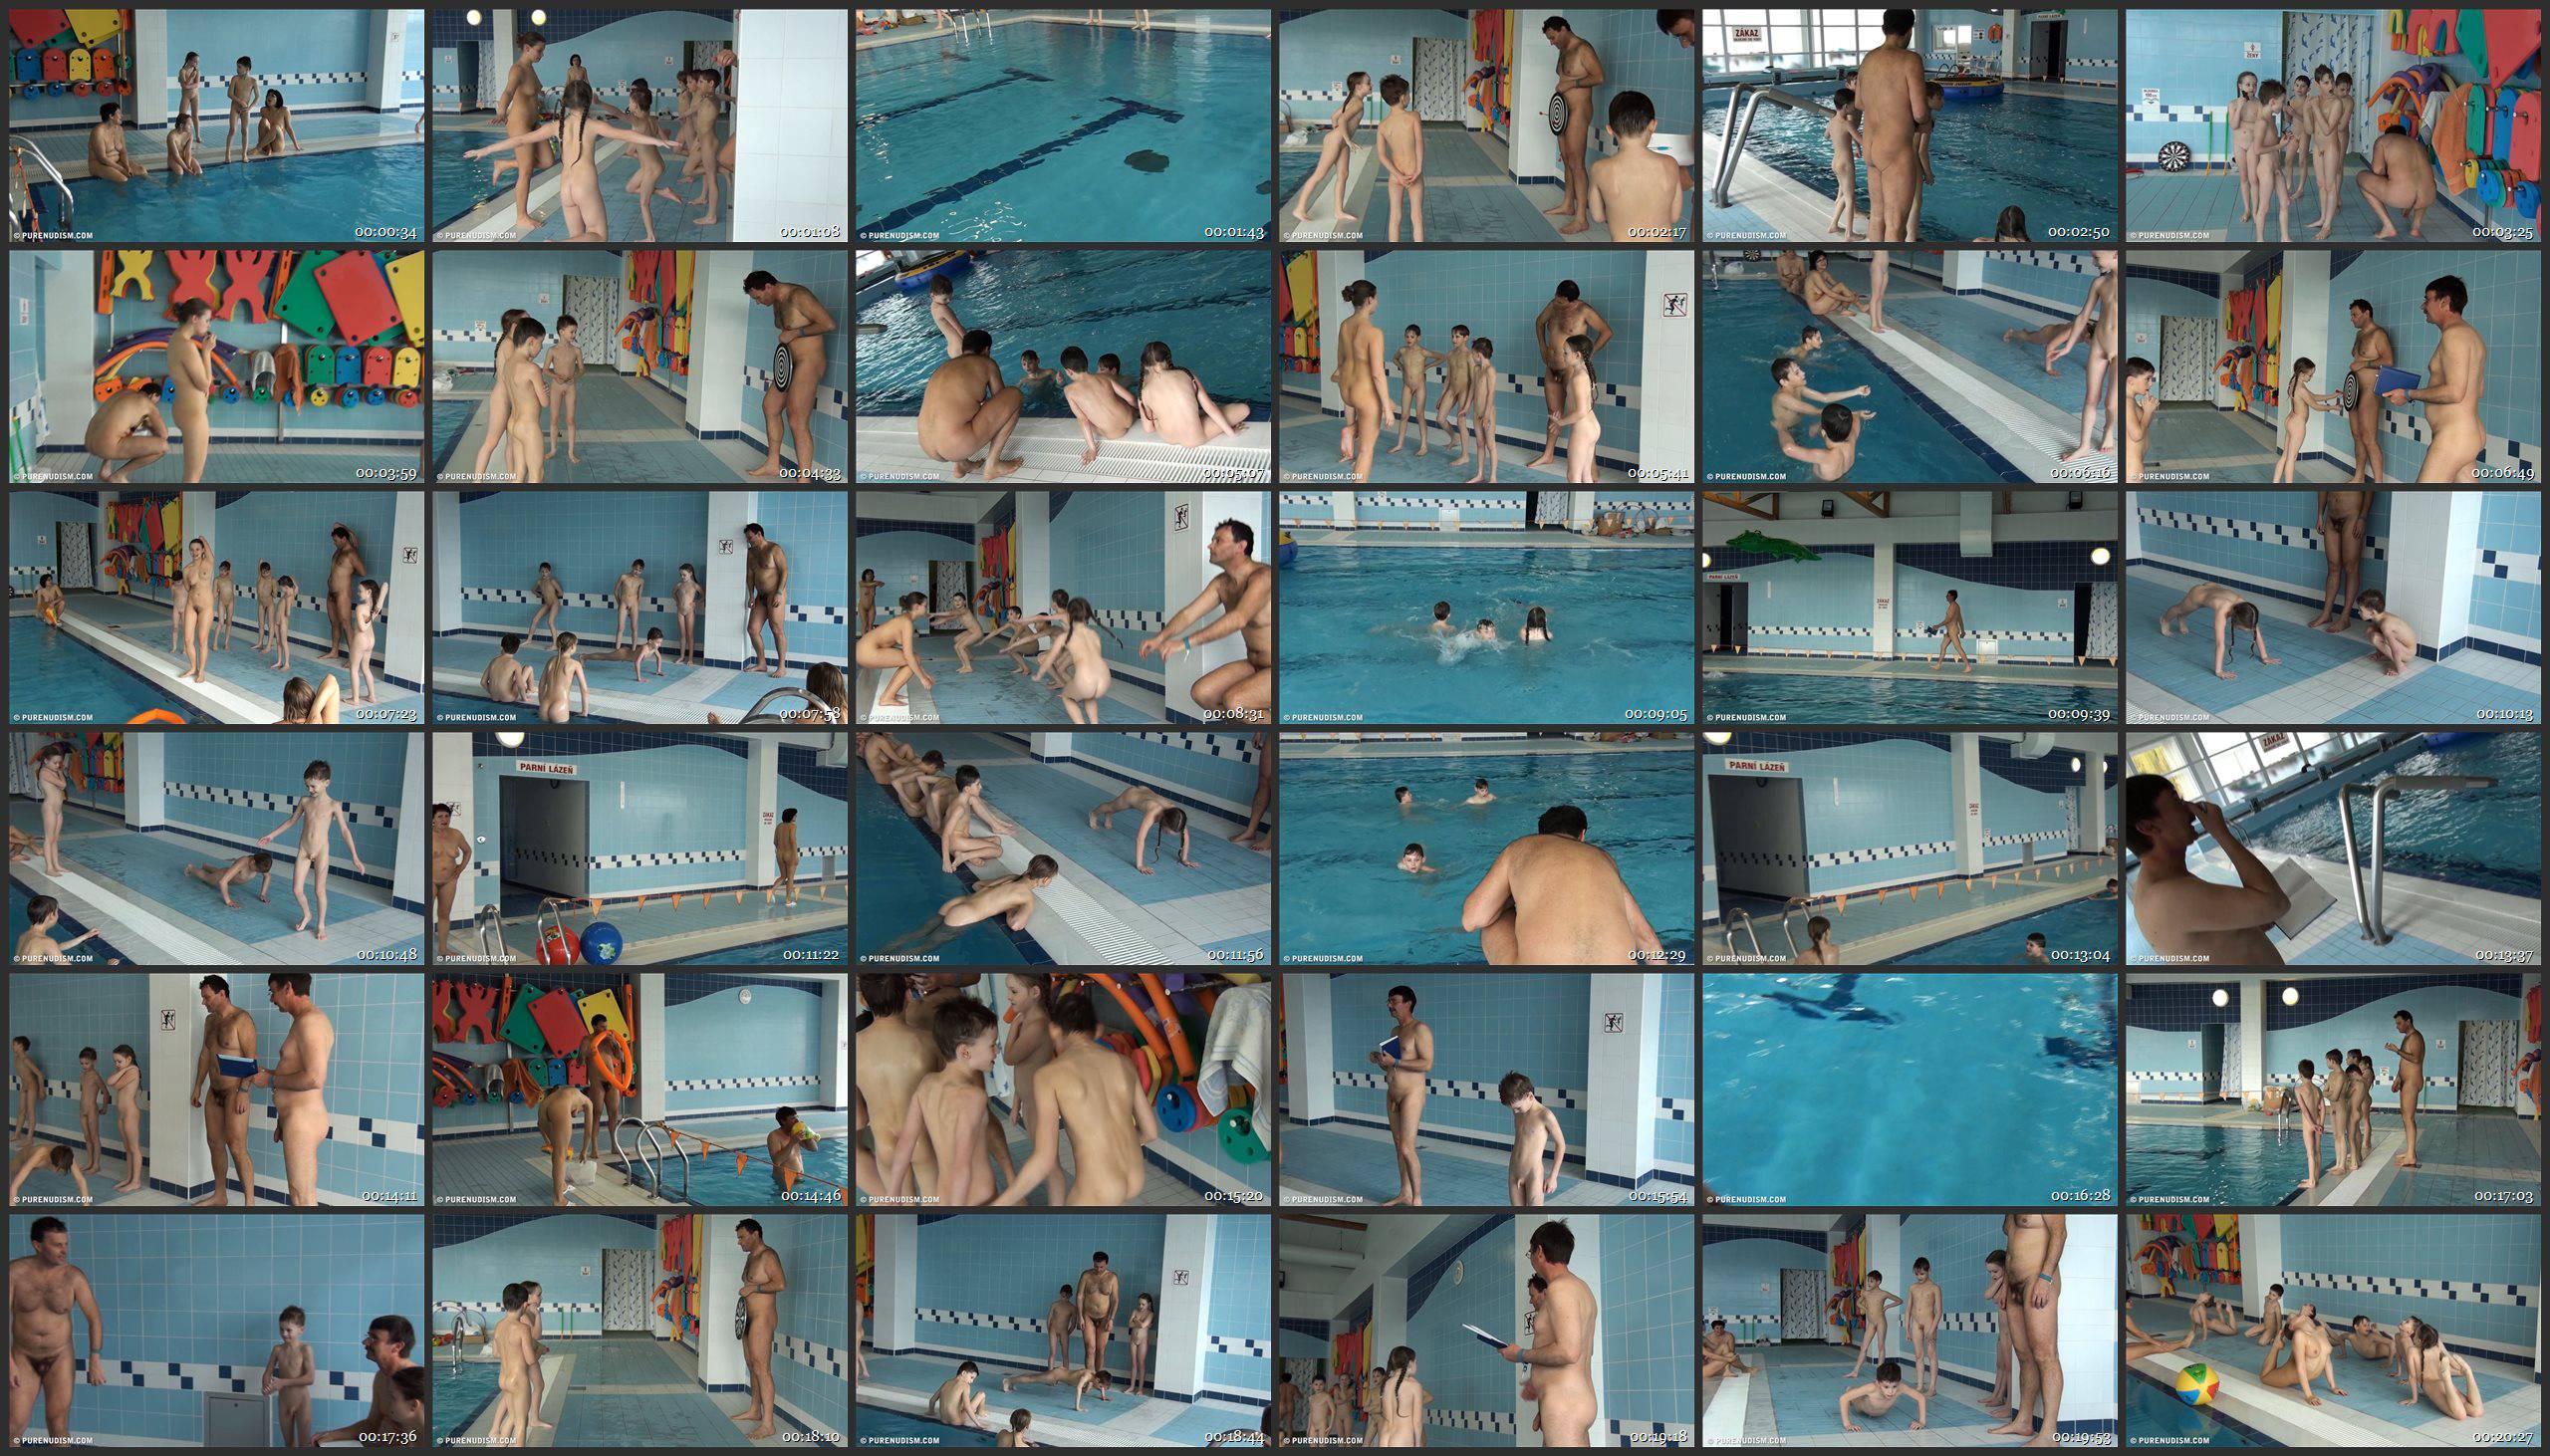 Activity Pool - Thumbnails